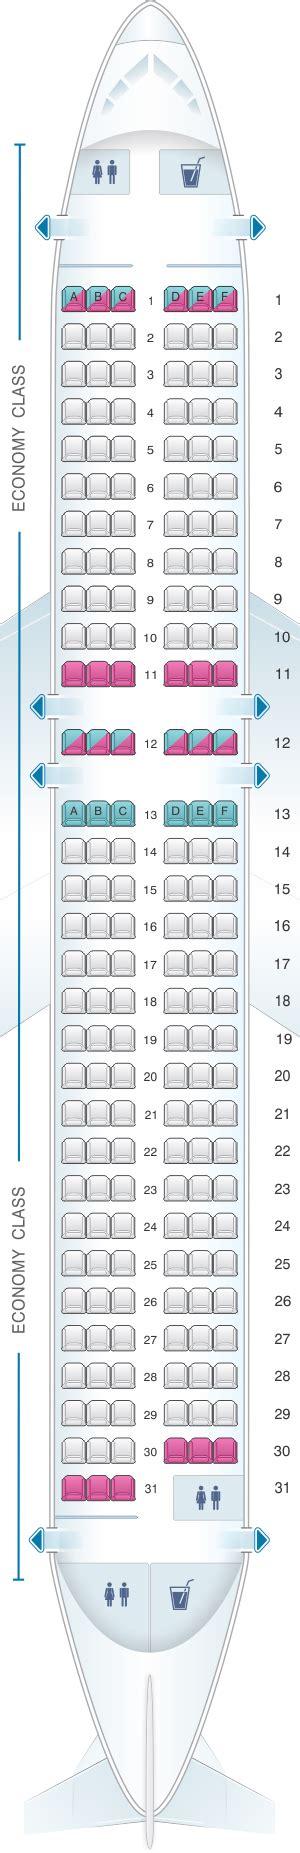 easyjet siege plan de cabine easyjet airbus a320 seatmaestro fr